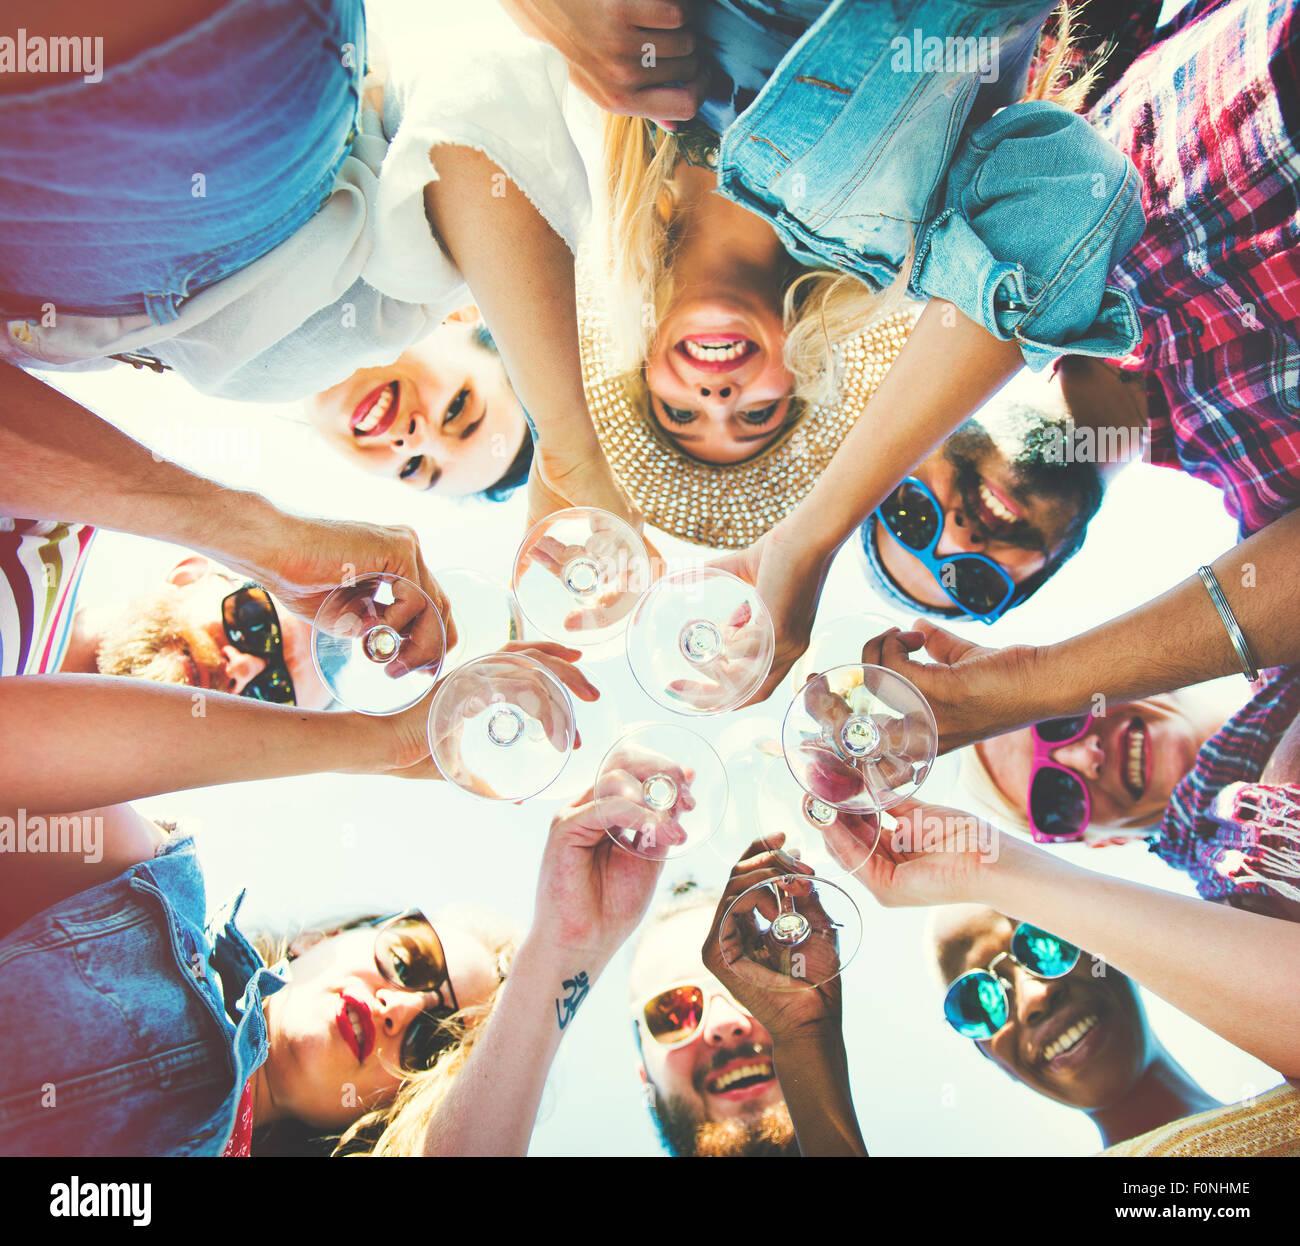 Beach Cheers Celebration Friendship Summer Fun Concept - Stock Image